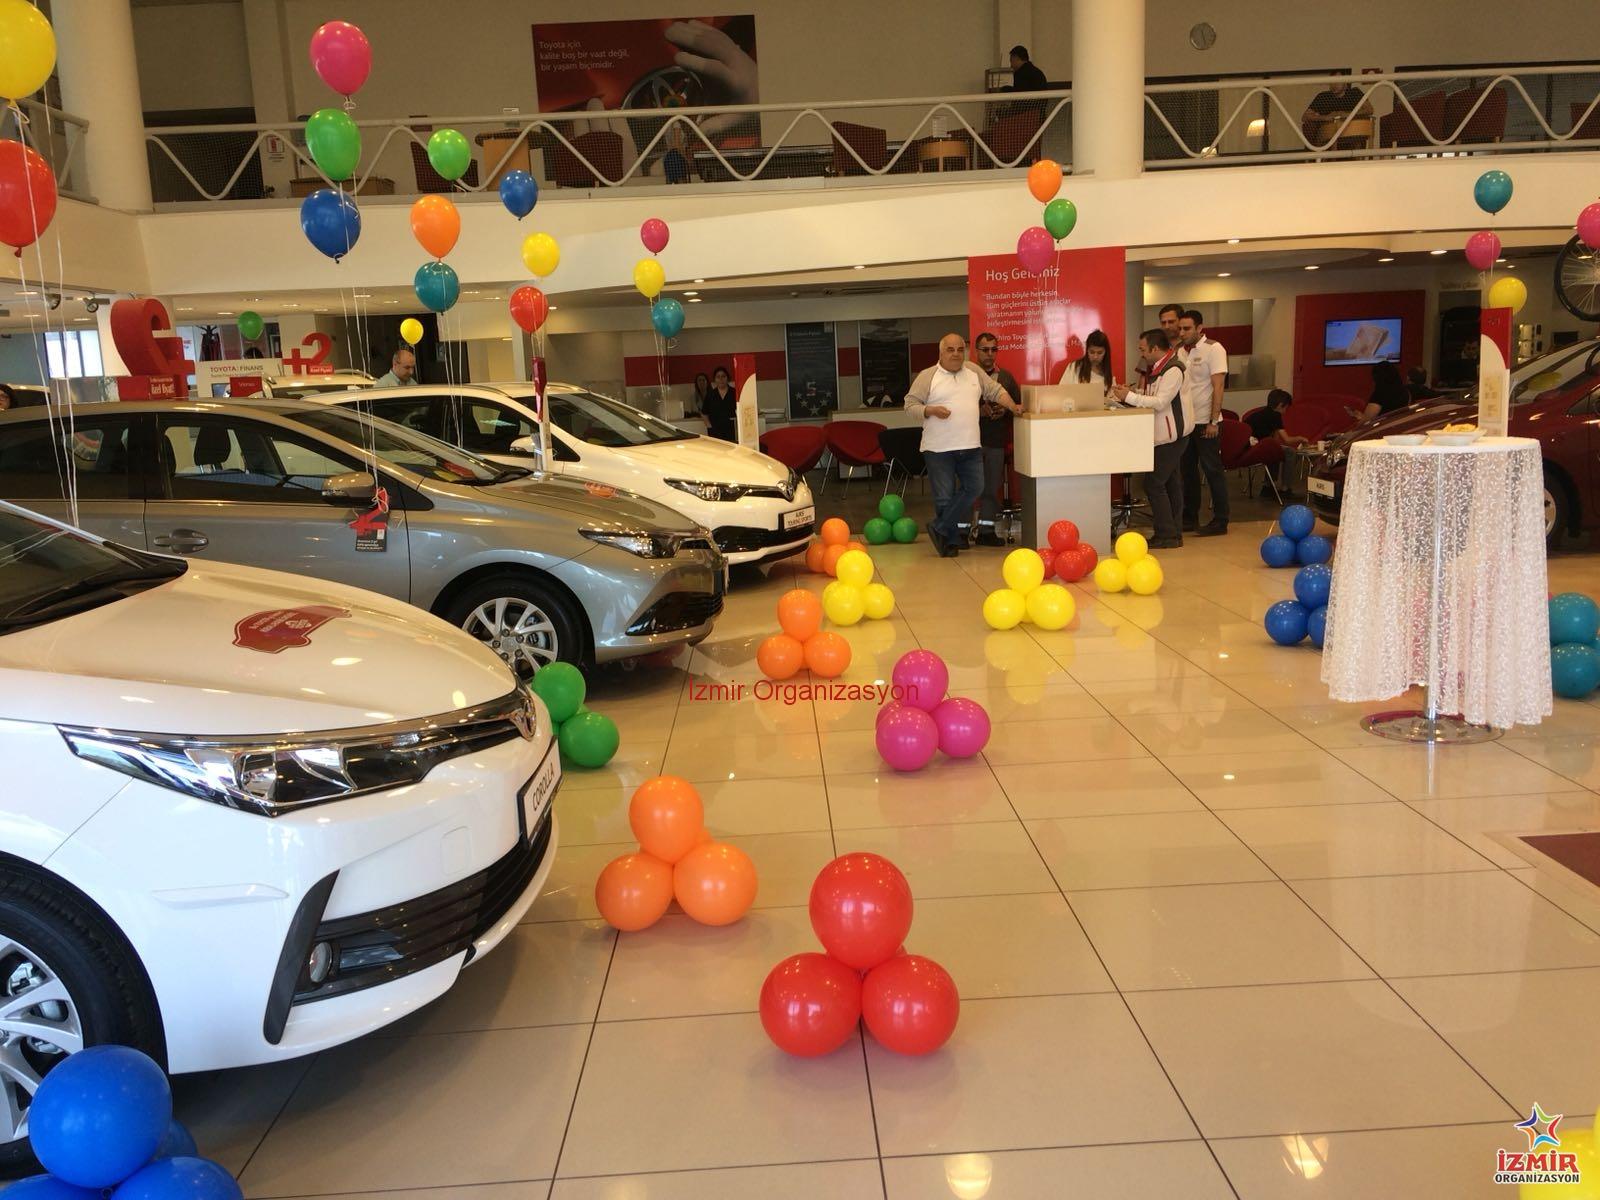 Toyota Borovali 23 Nisan Senlik Organizasyonu Izmir Organizasyon